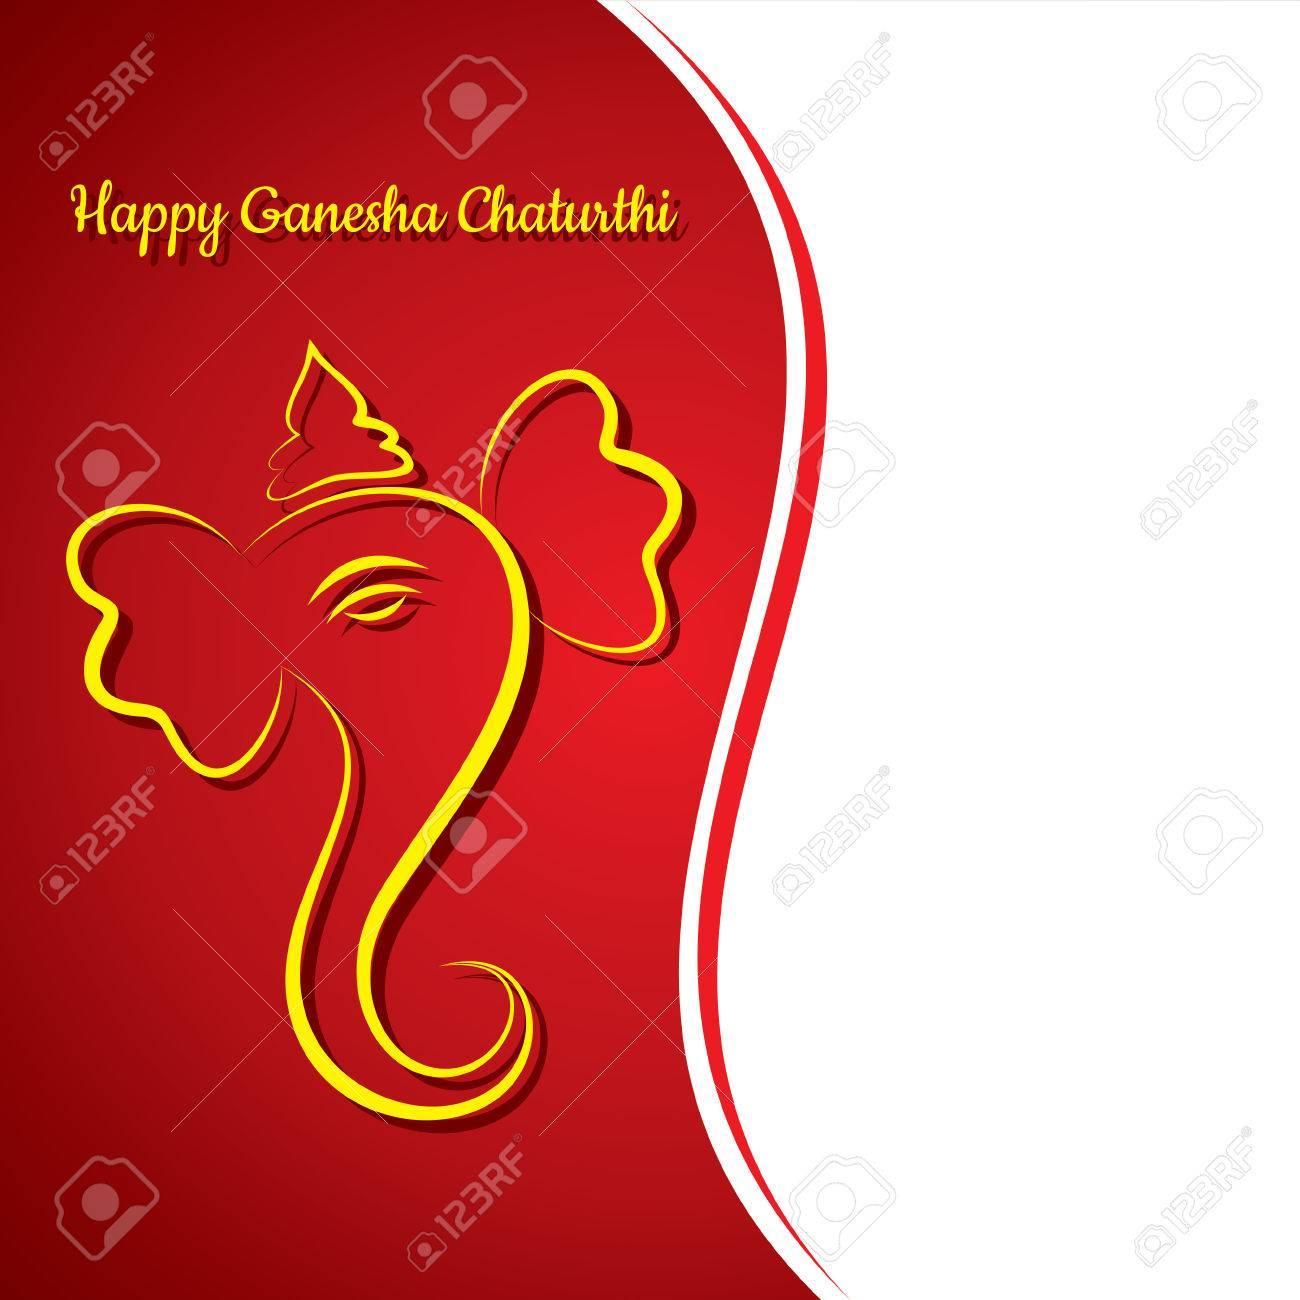 3841 ganesh stock illustrations cliparts and royalty free ganesh creative ganesh chaturthi festival greeting card background vector buycottarizona